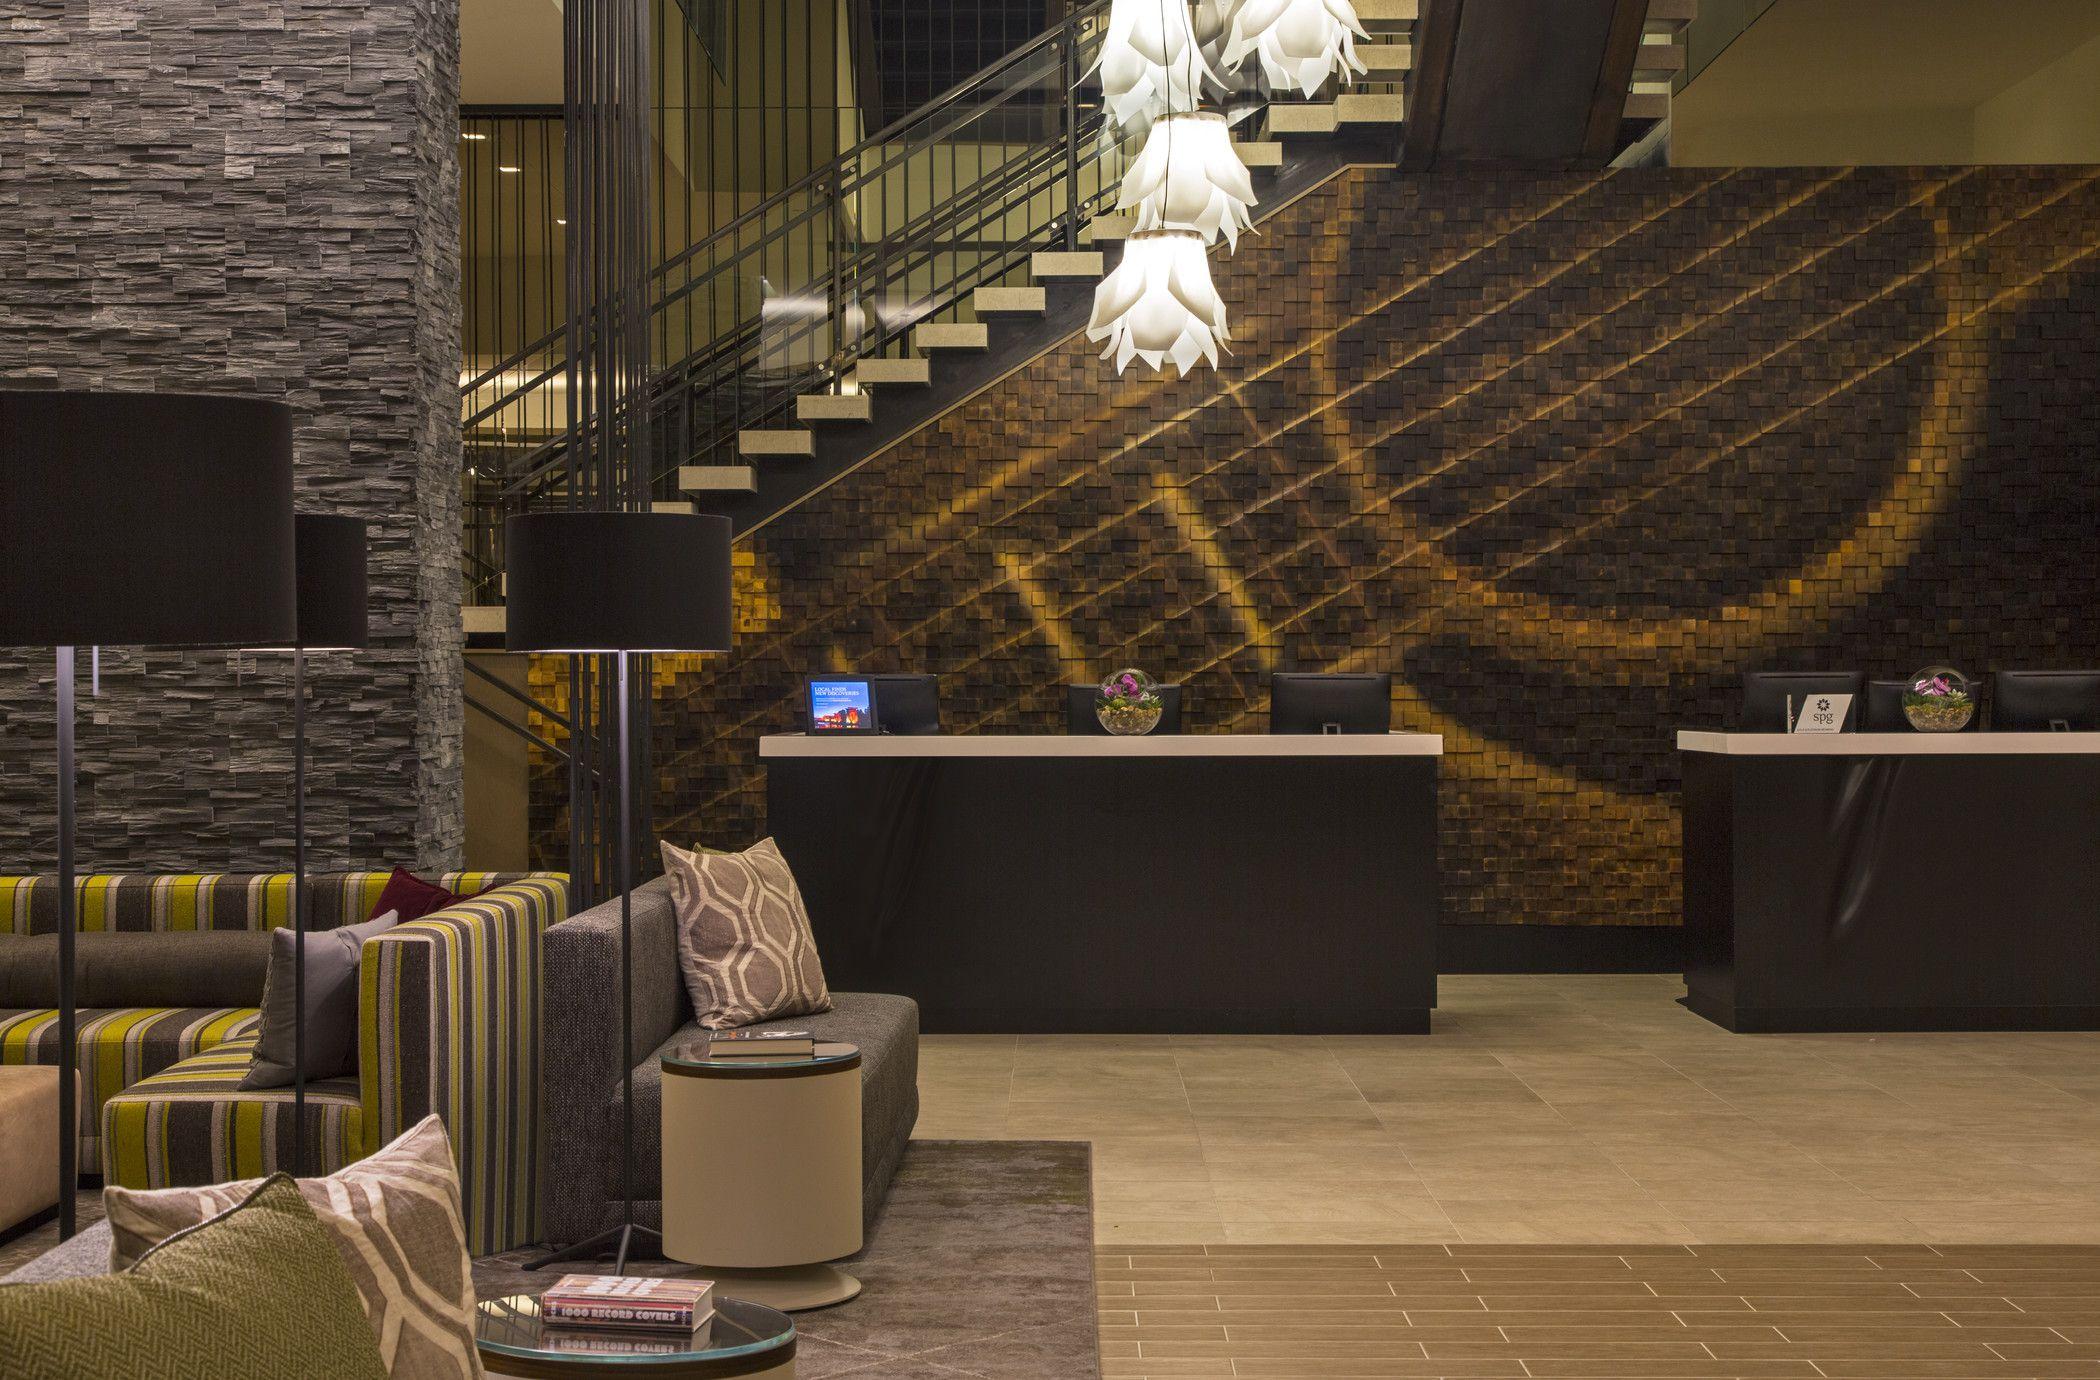 top 10 hotels near 6th street in austin tx. Black Bedroom Furniture Sets. Home Design Ideas